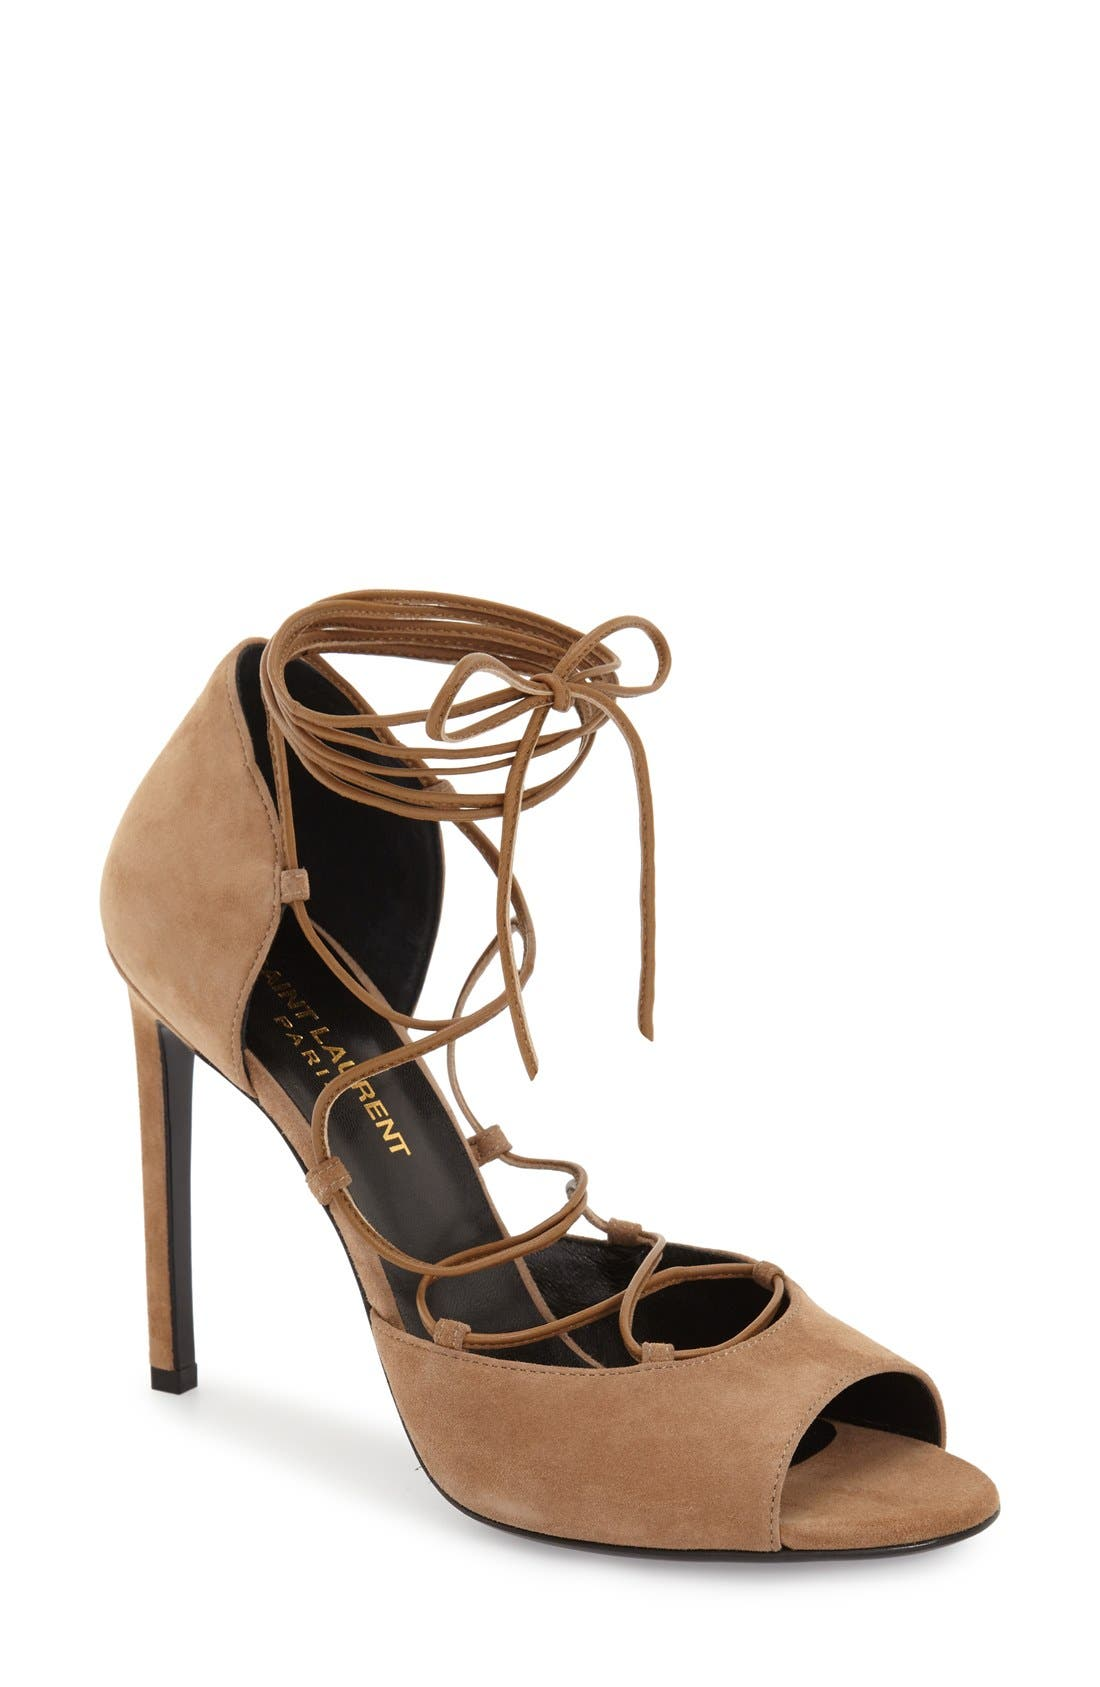 Alternate Image 1 Selected - Saint Laurent 'Kate' Lace-Up Sandal (Women)